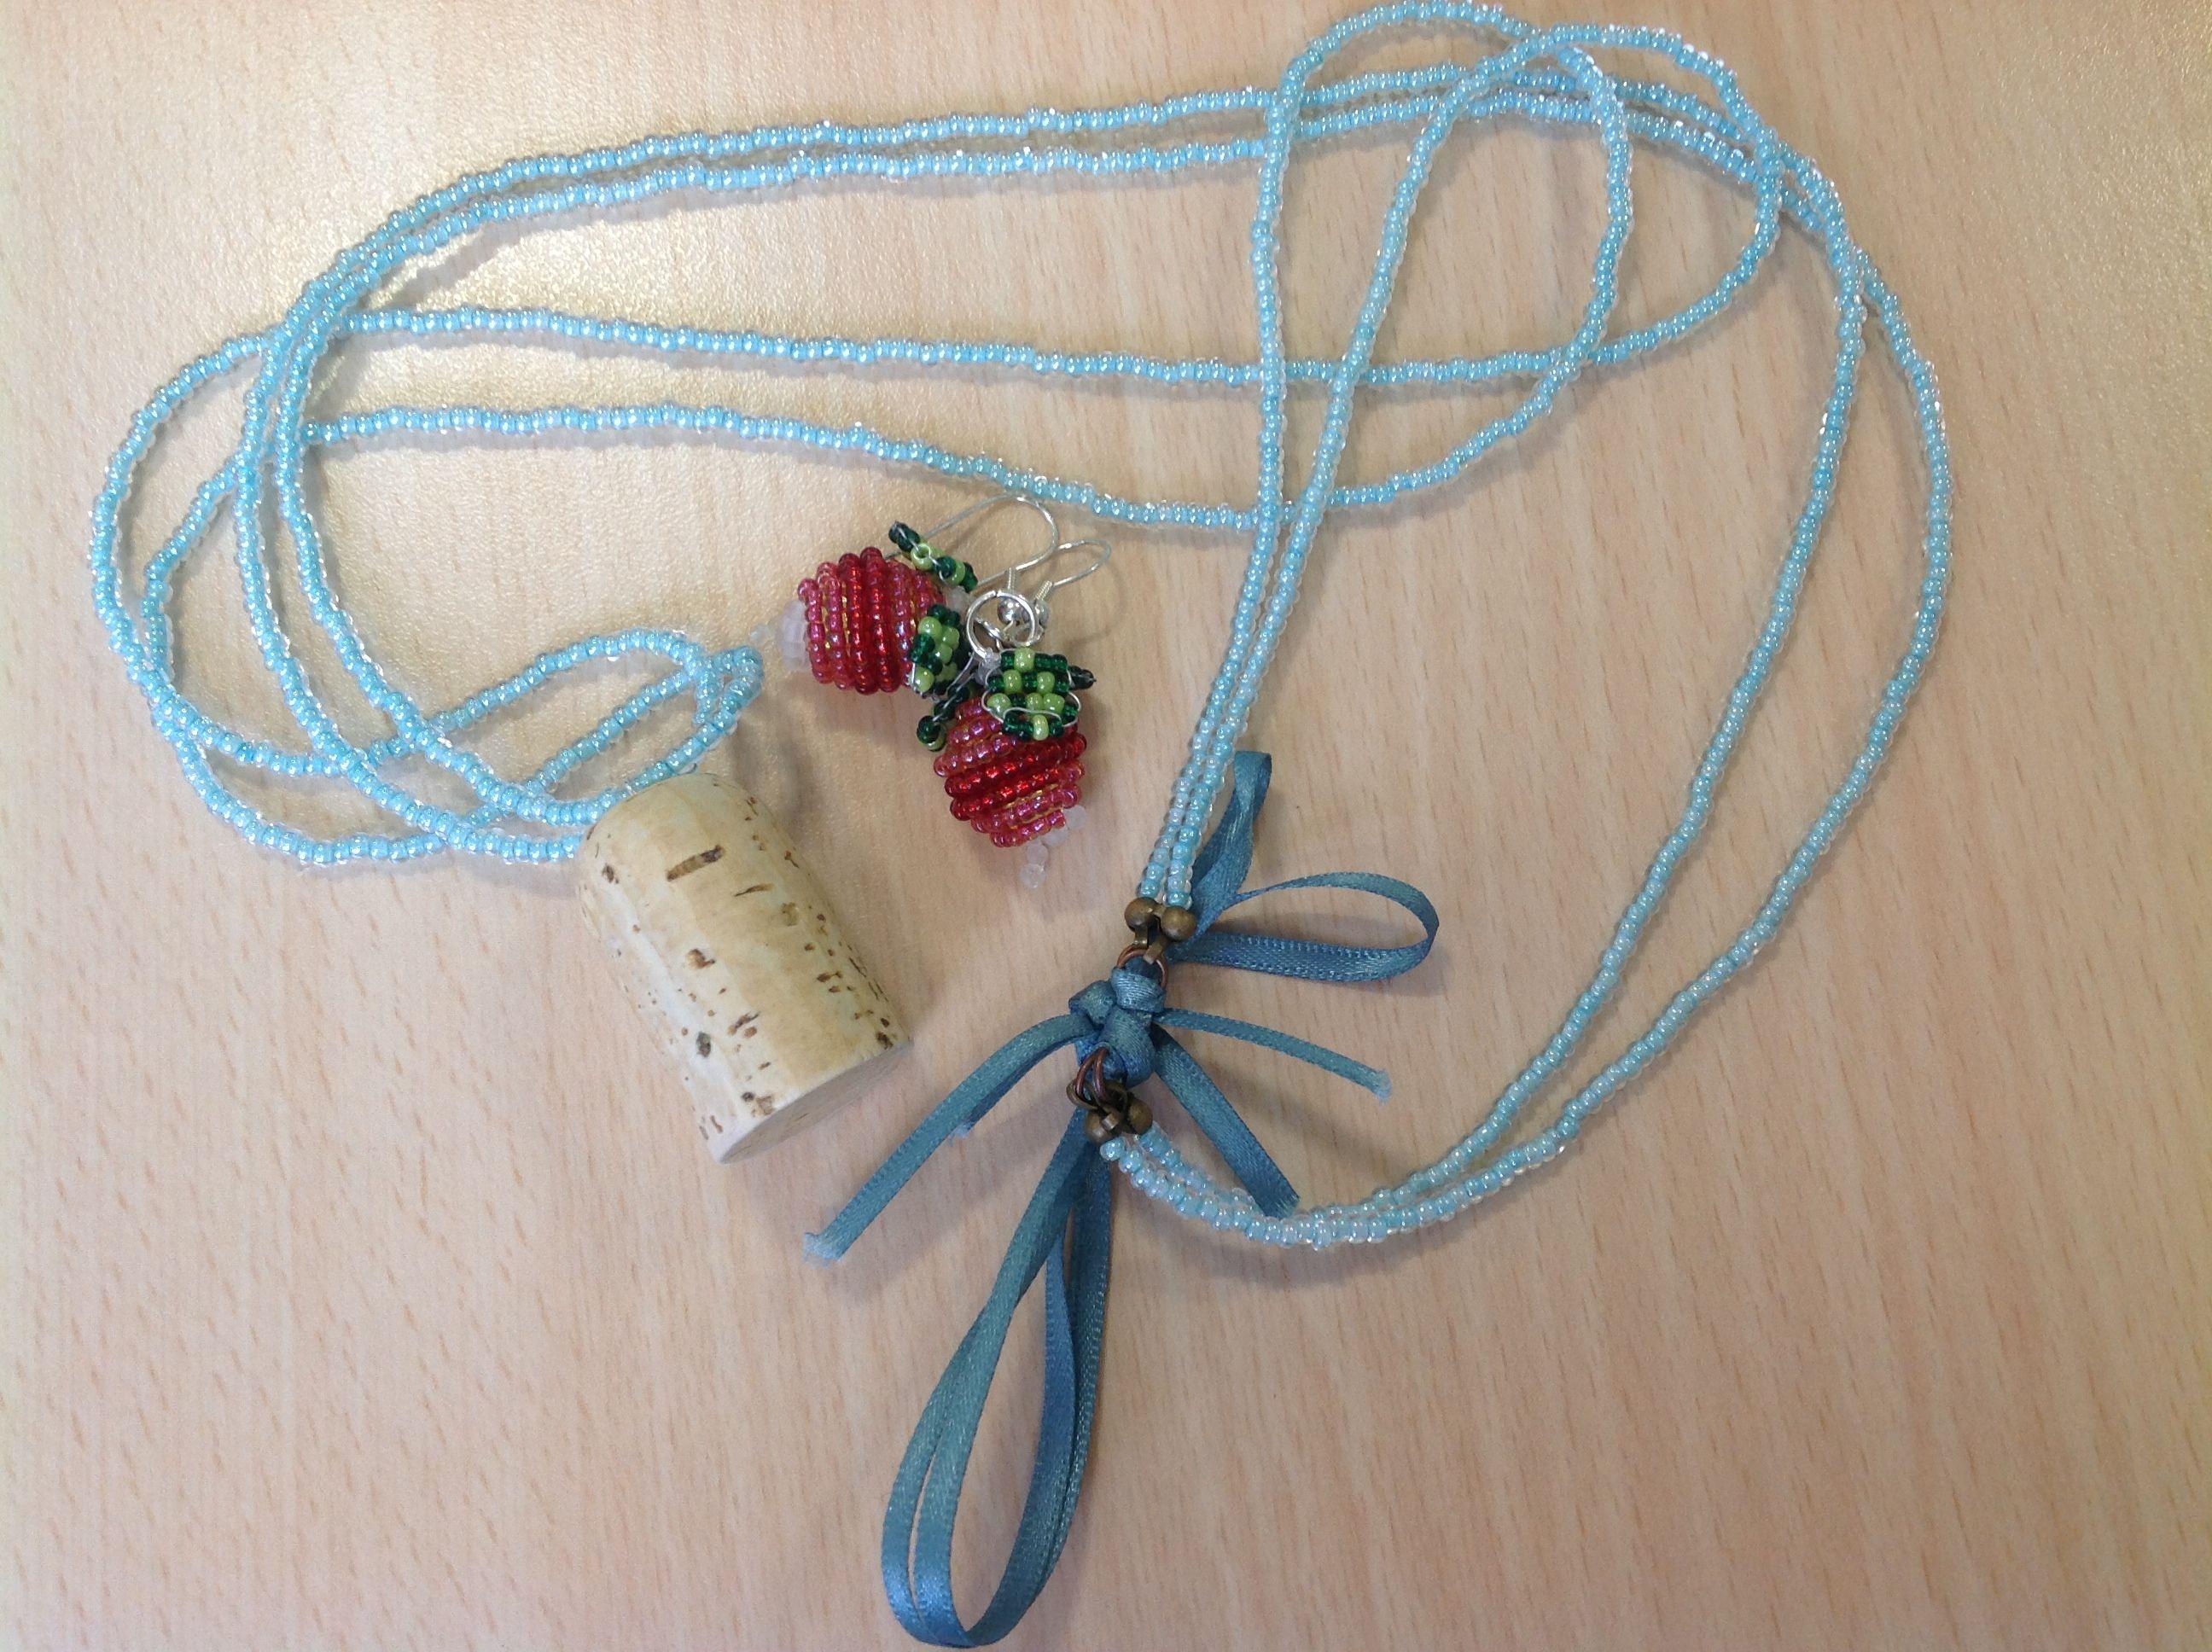 Luna Lovegood's nargle charm and radish earrings